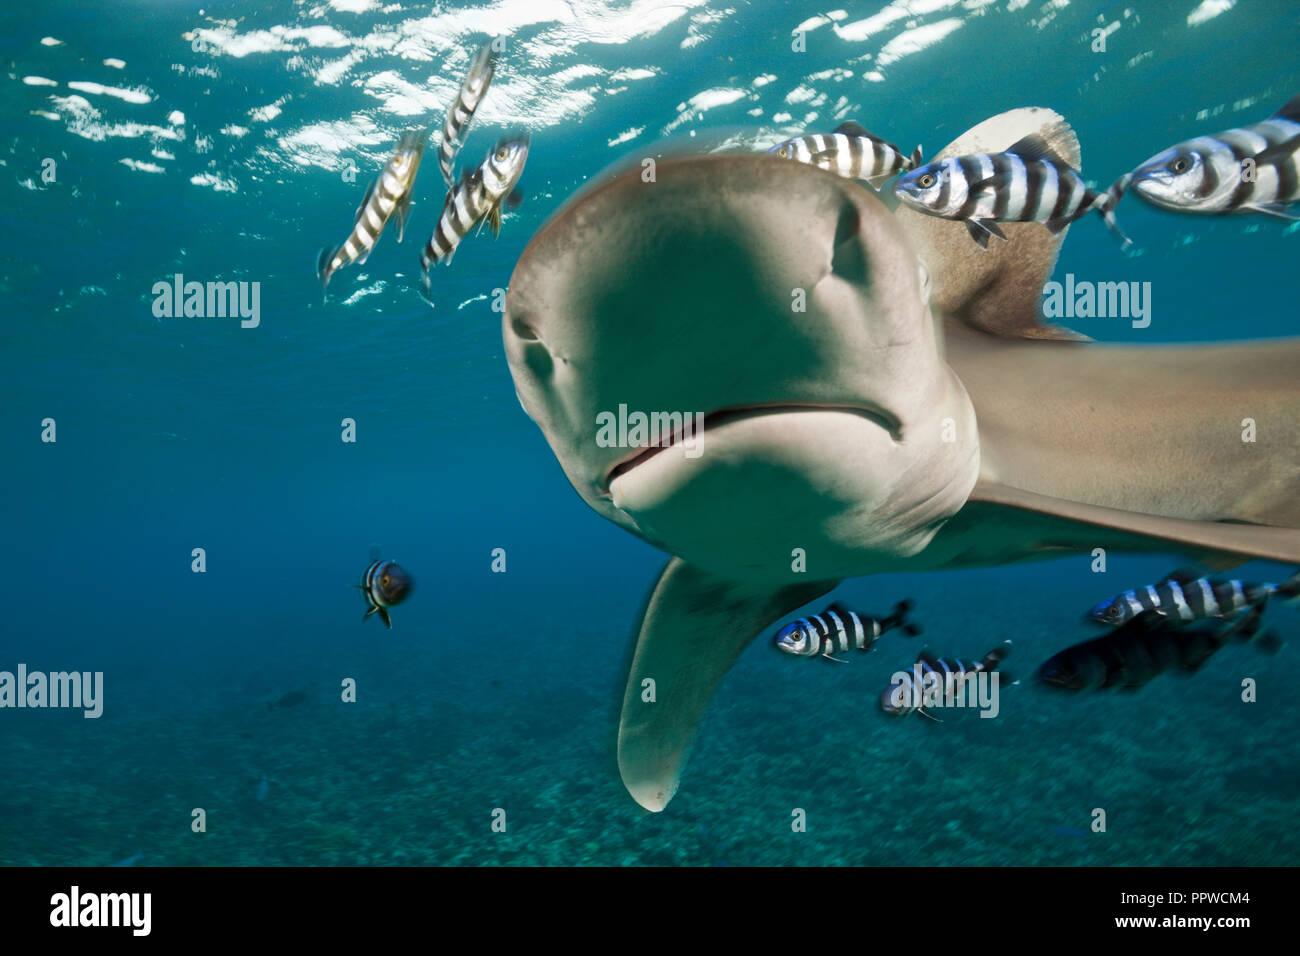 Oceanic Whitetip Shark, Carcharhinus longimanus, Brother Islands, Red Sea, Egypt - Stock Image